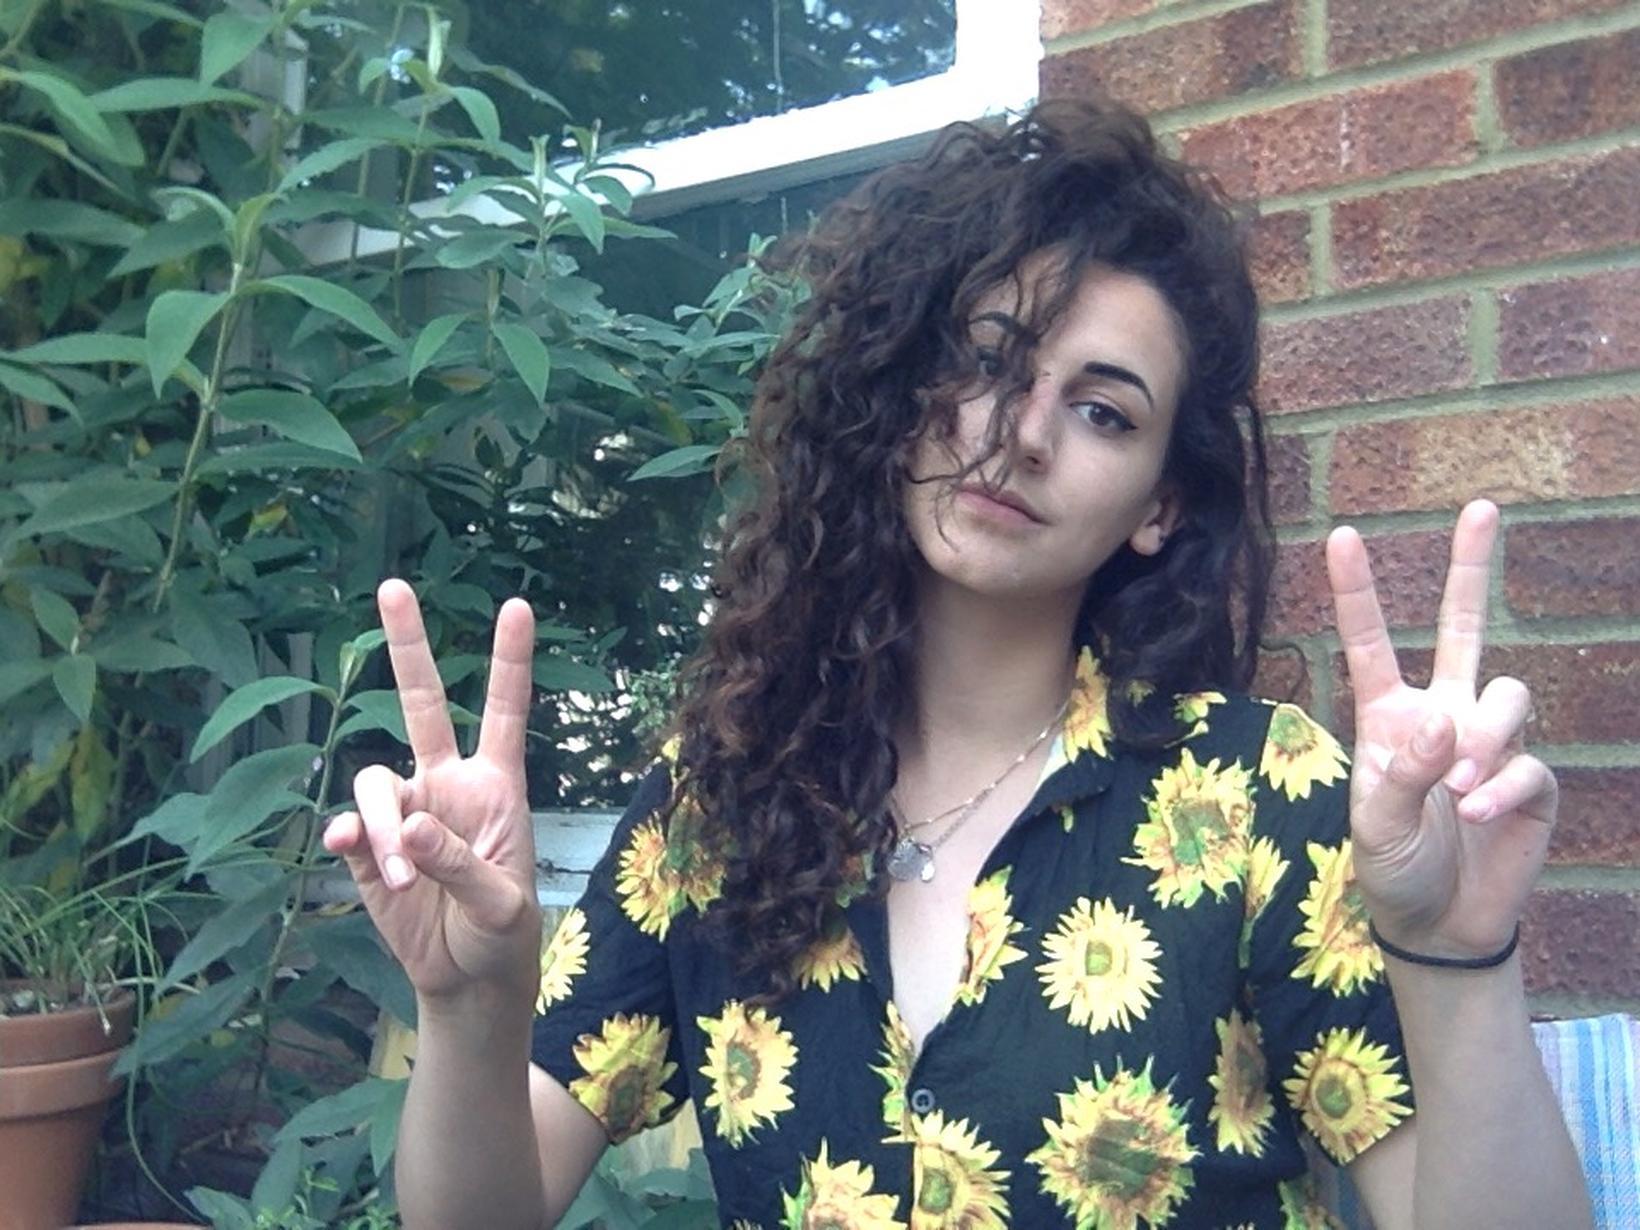 Chloe from London, United Kingdom